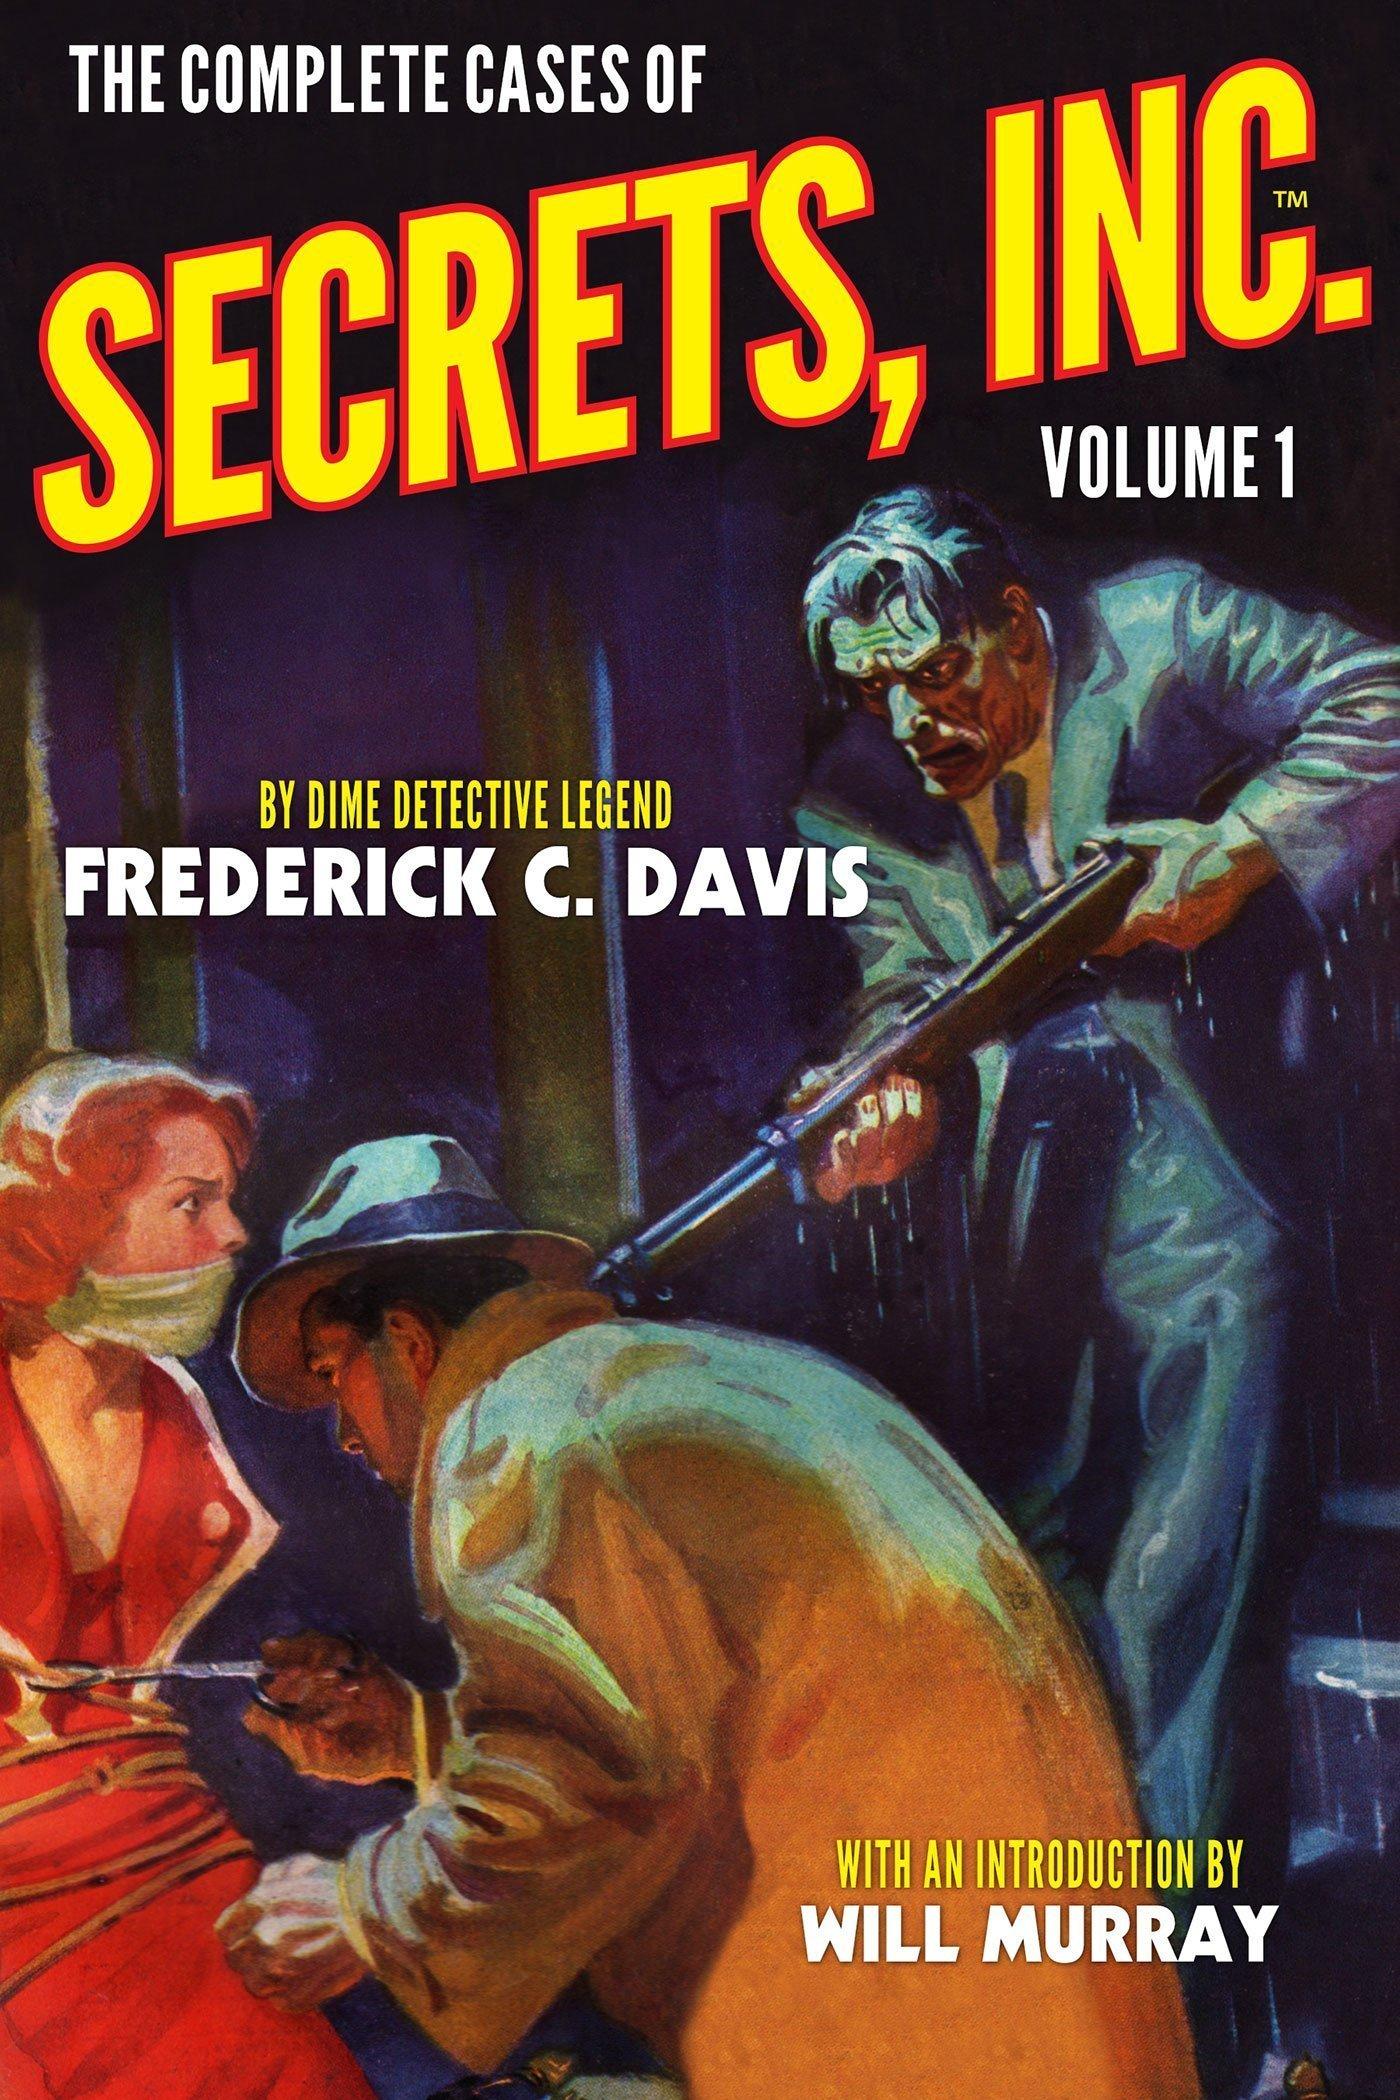 The Complete Cases of Secrets, Inc., Volume 1 - Dime Detective